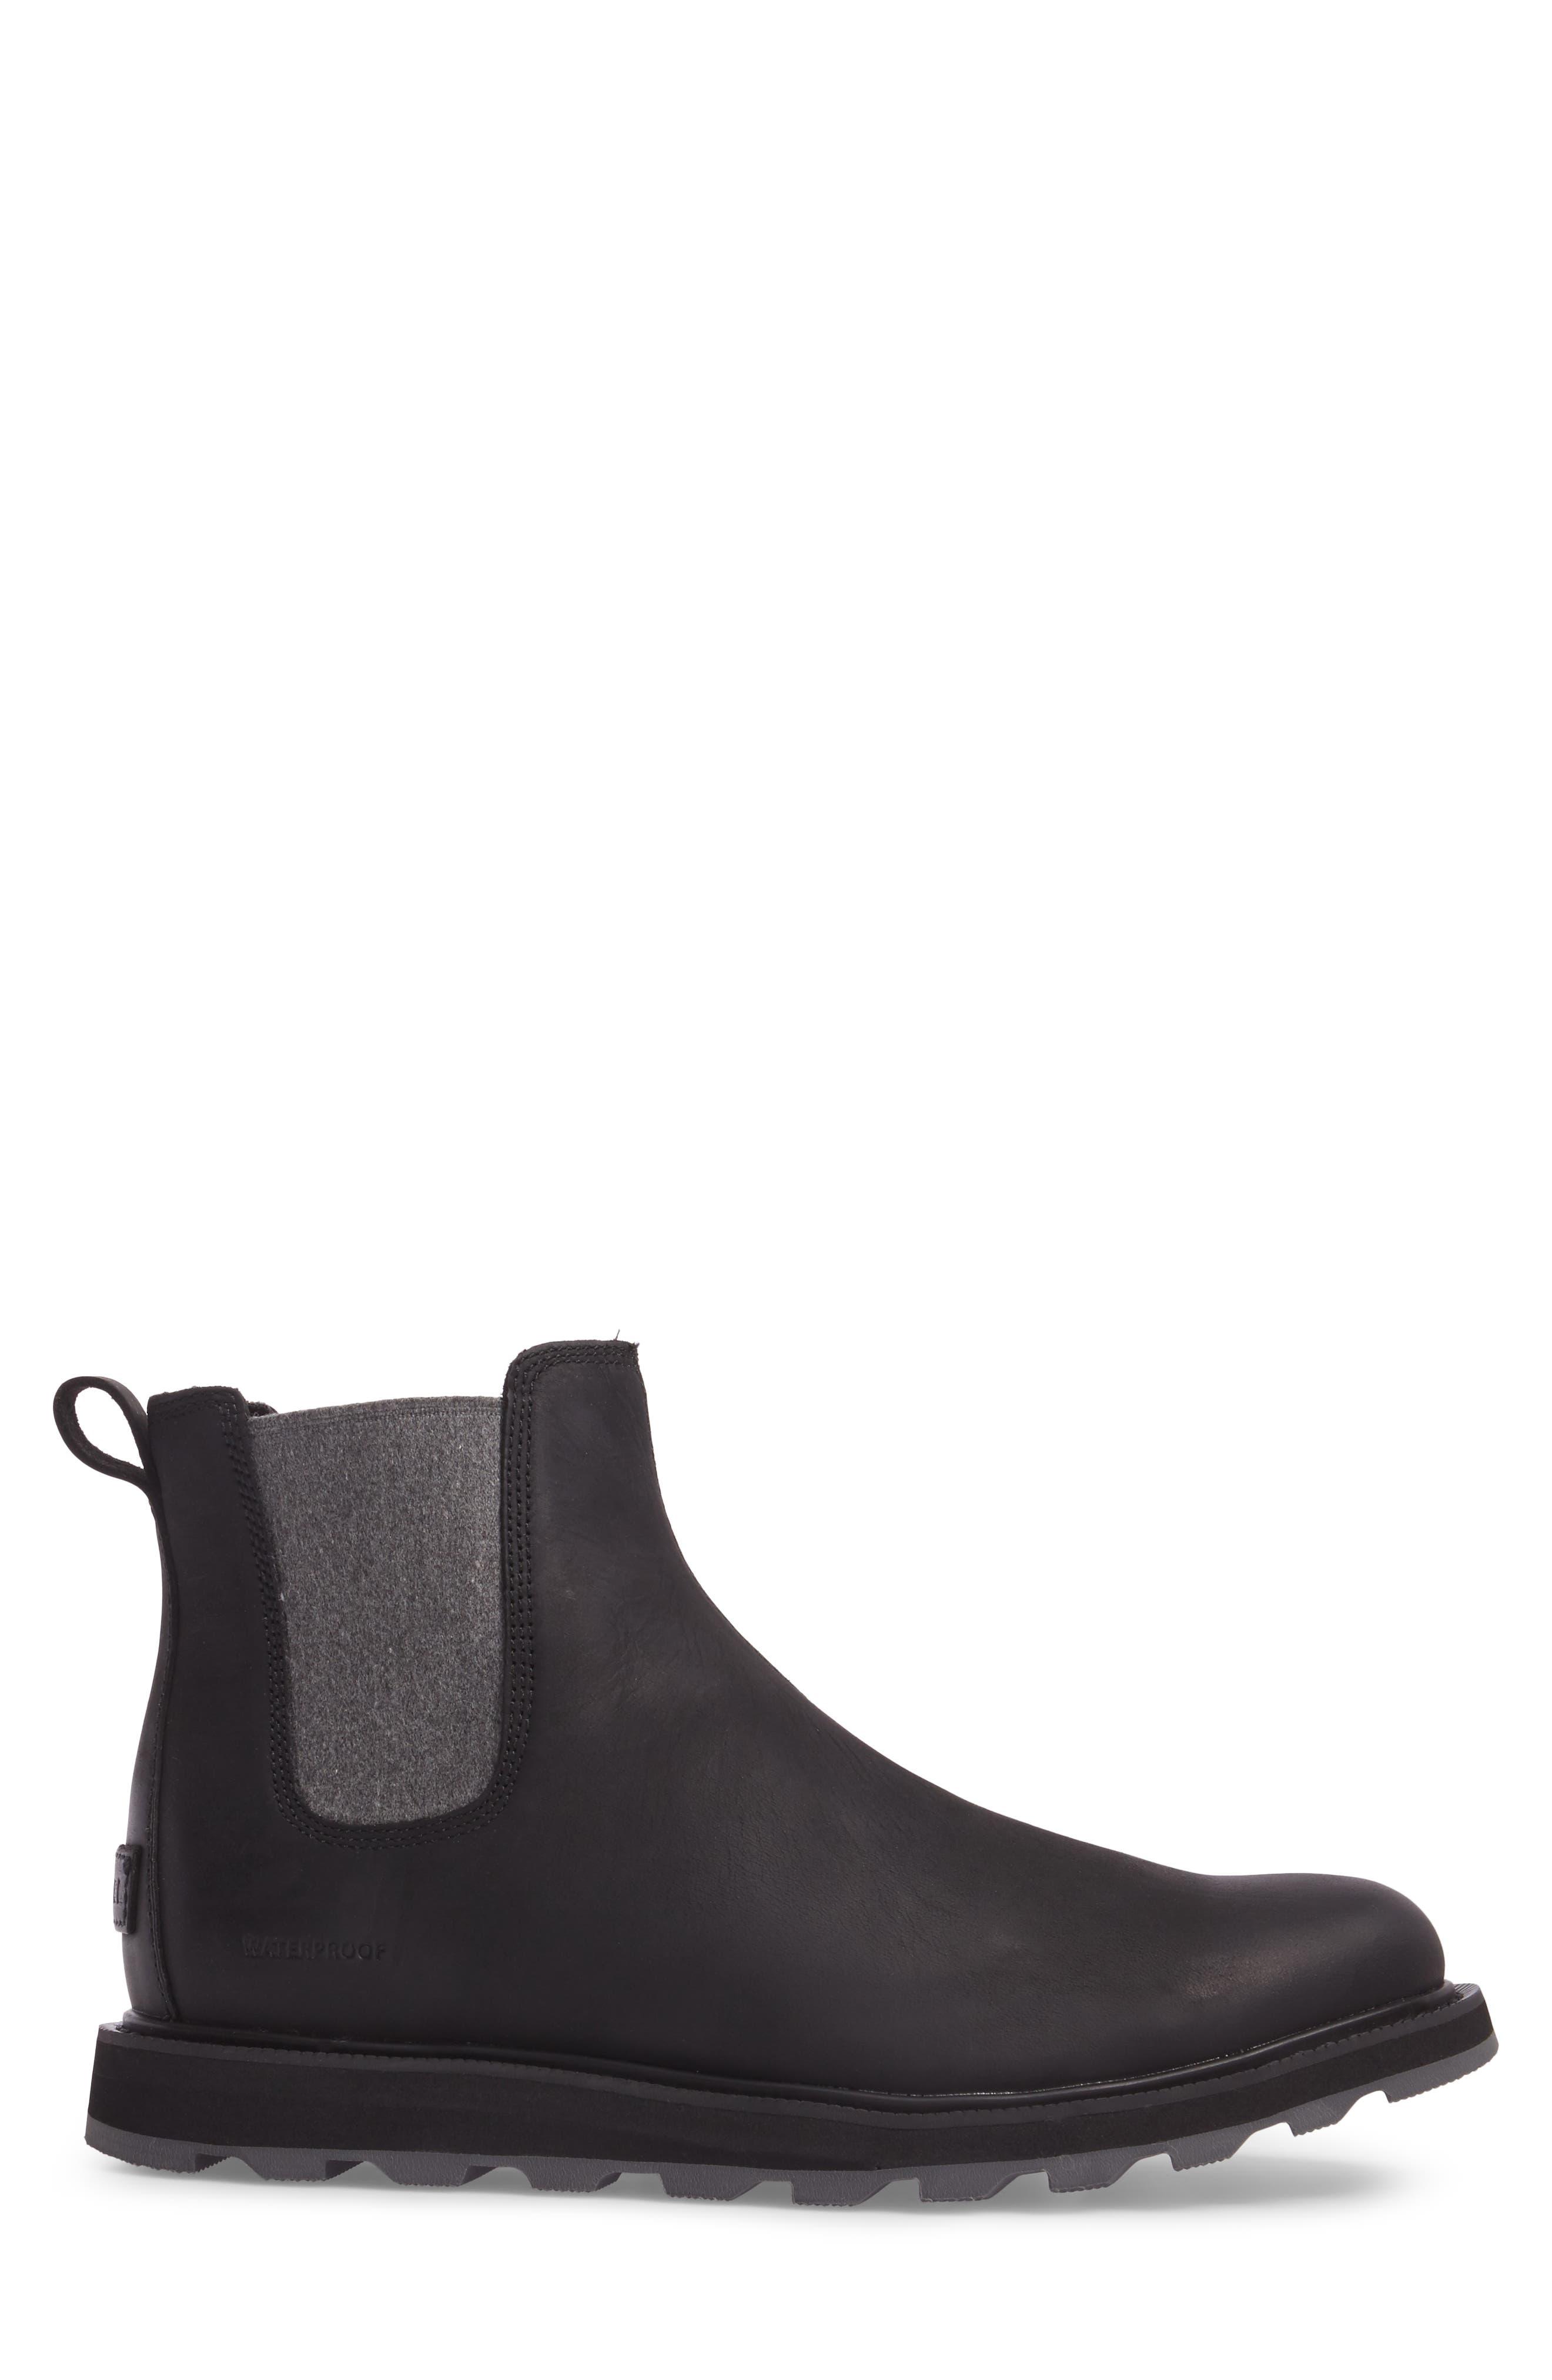 Madson Waterproof Chelsea Boot,                             Alternate thumbnail 3, color,                             Black